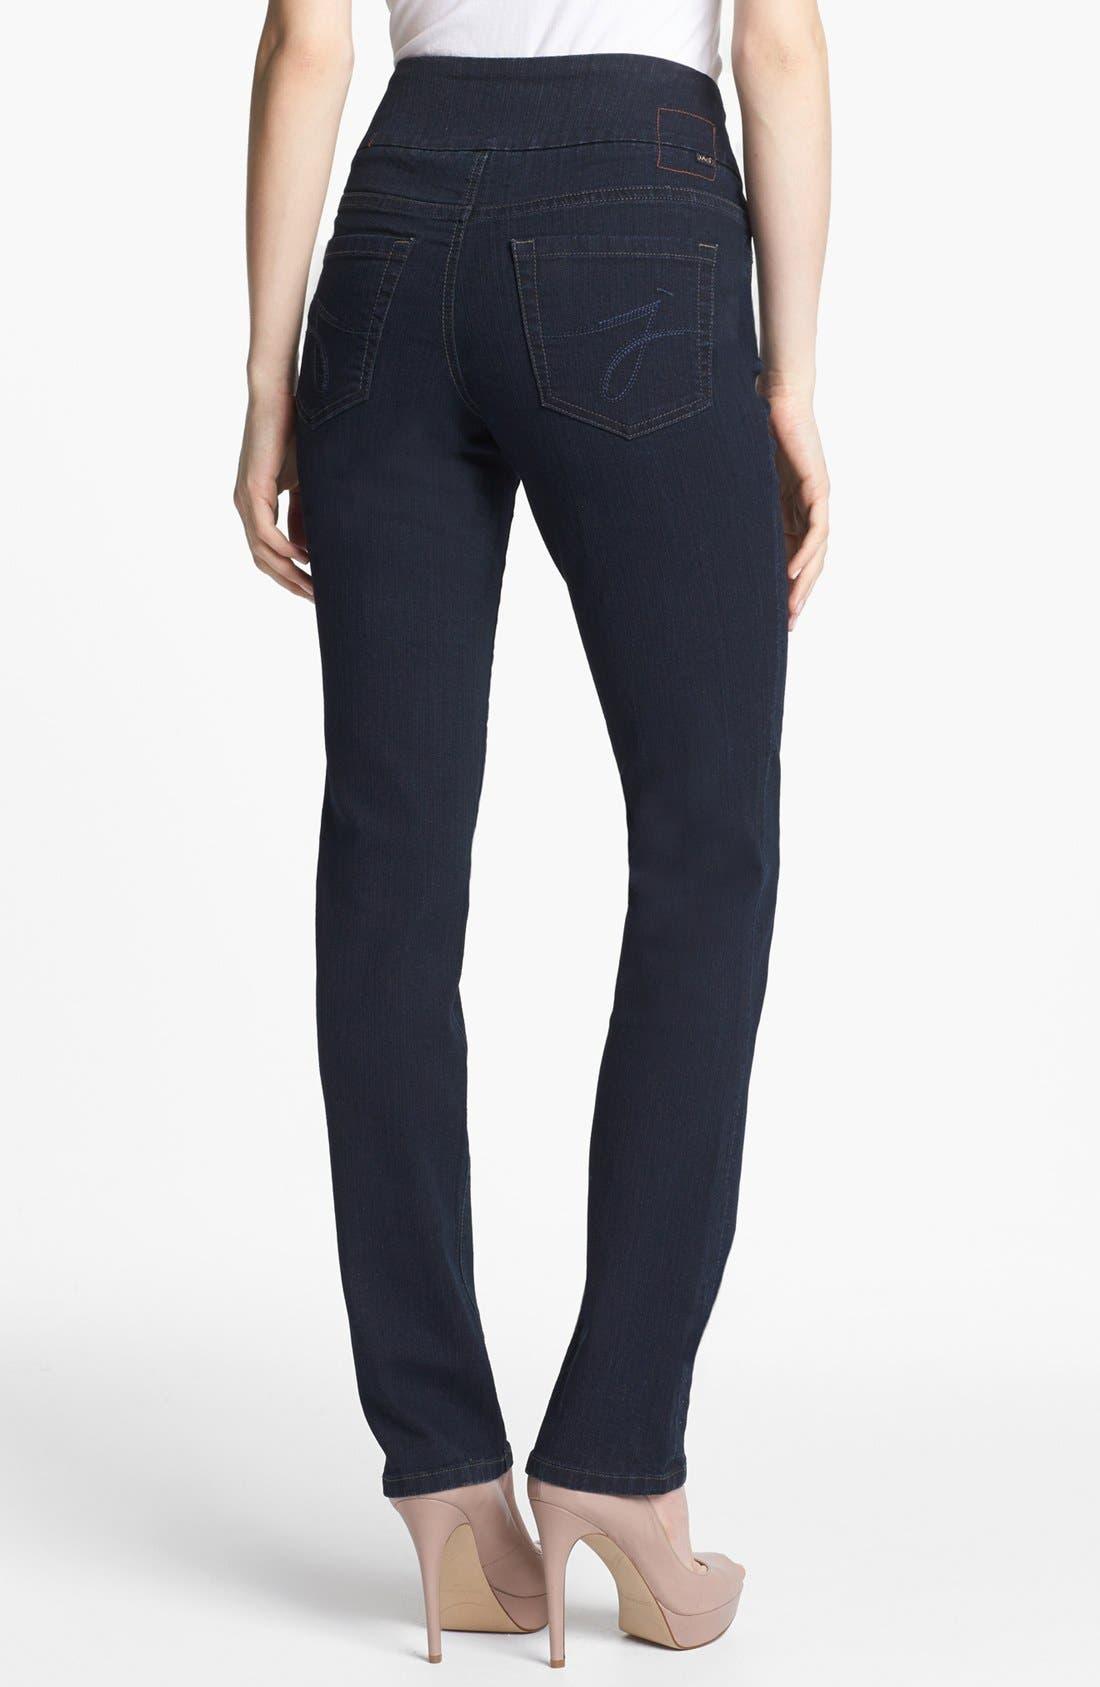 Alternate Image 2  - Jag Jeans 'Peri' Pull-On Straight Leg Jeans (Petite) (After Midnight)